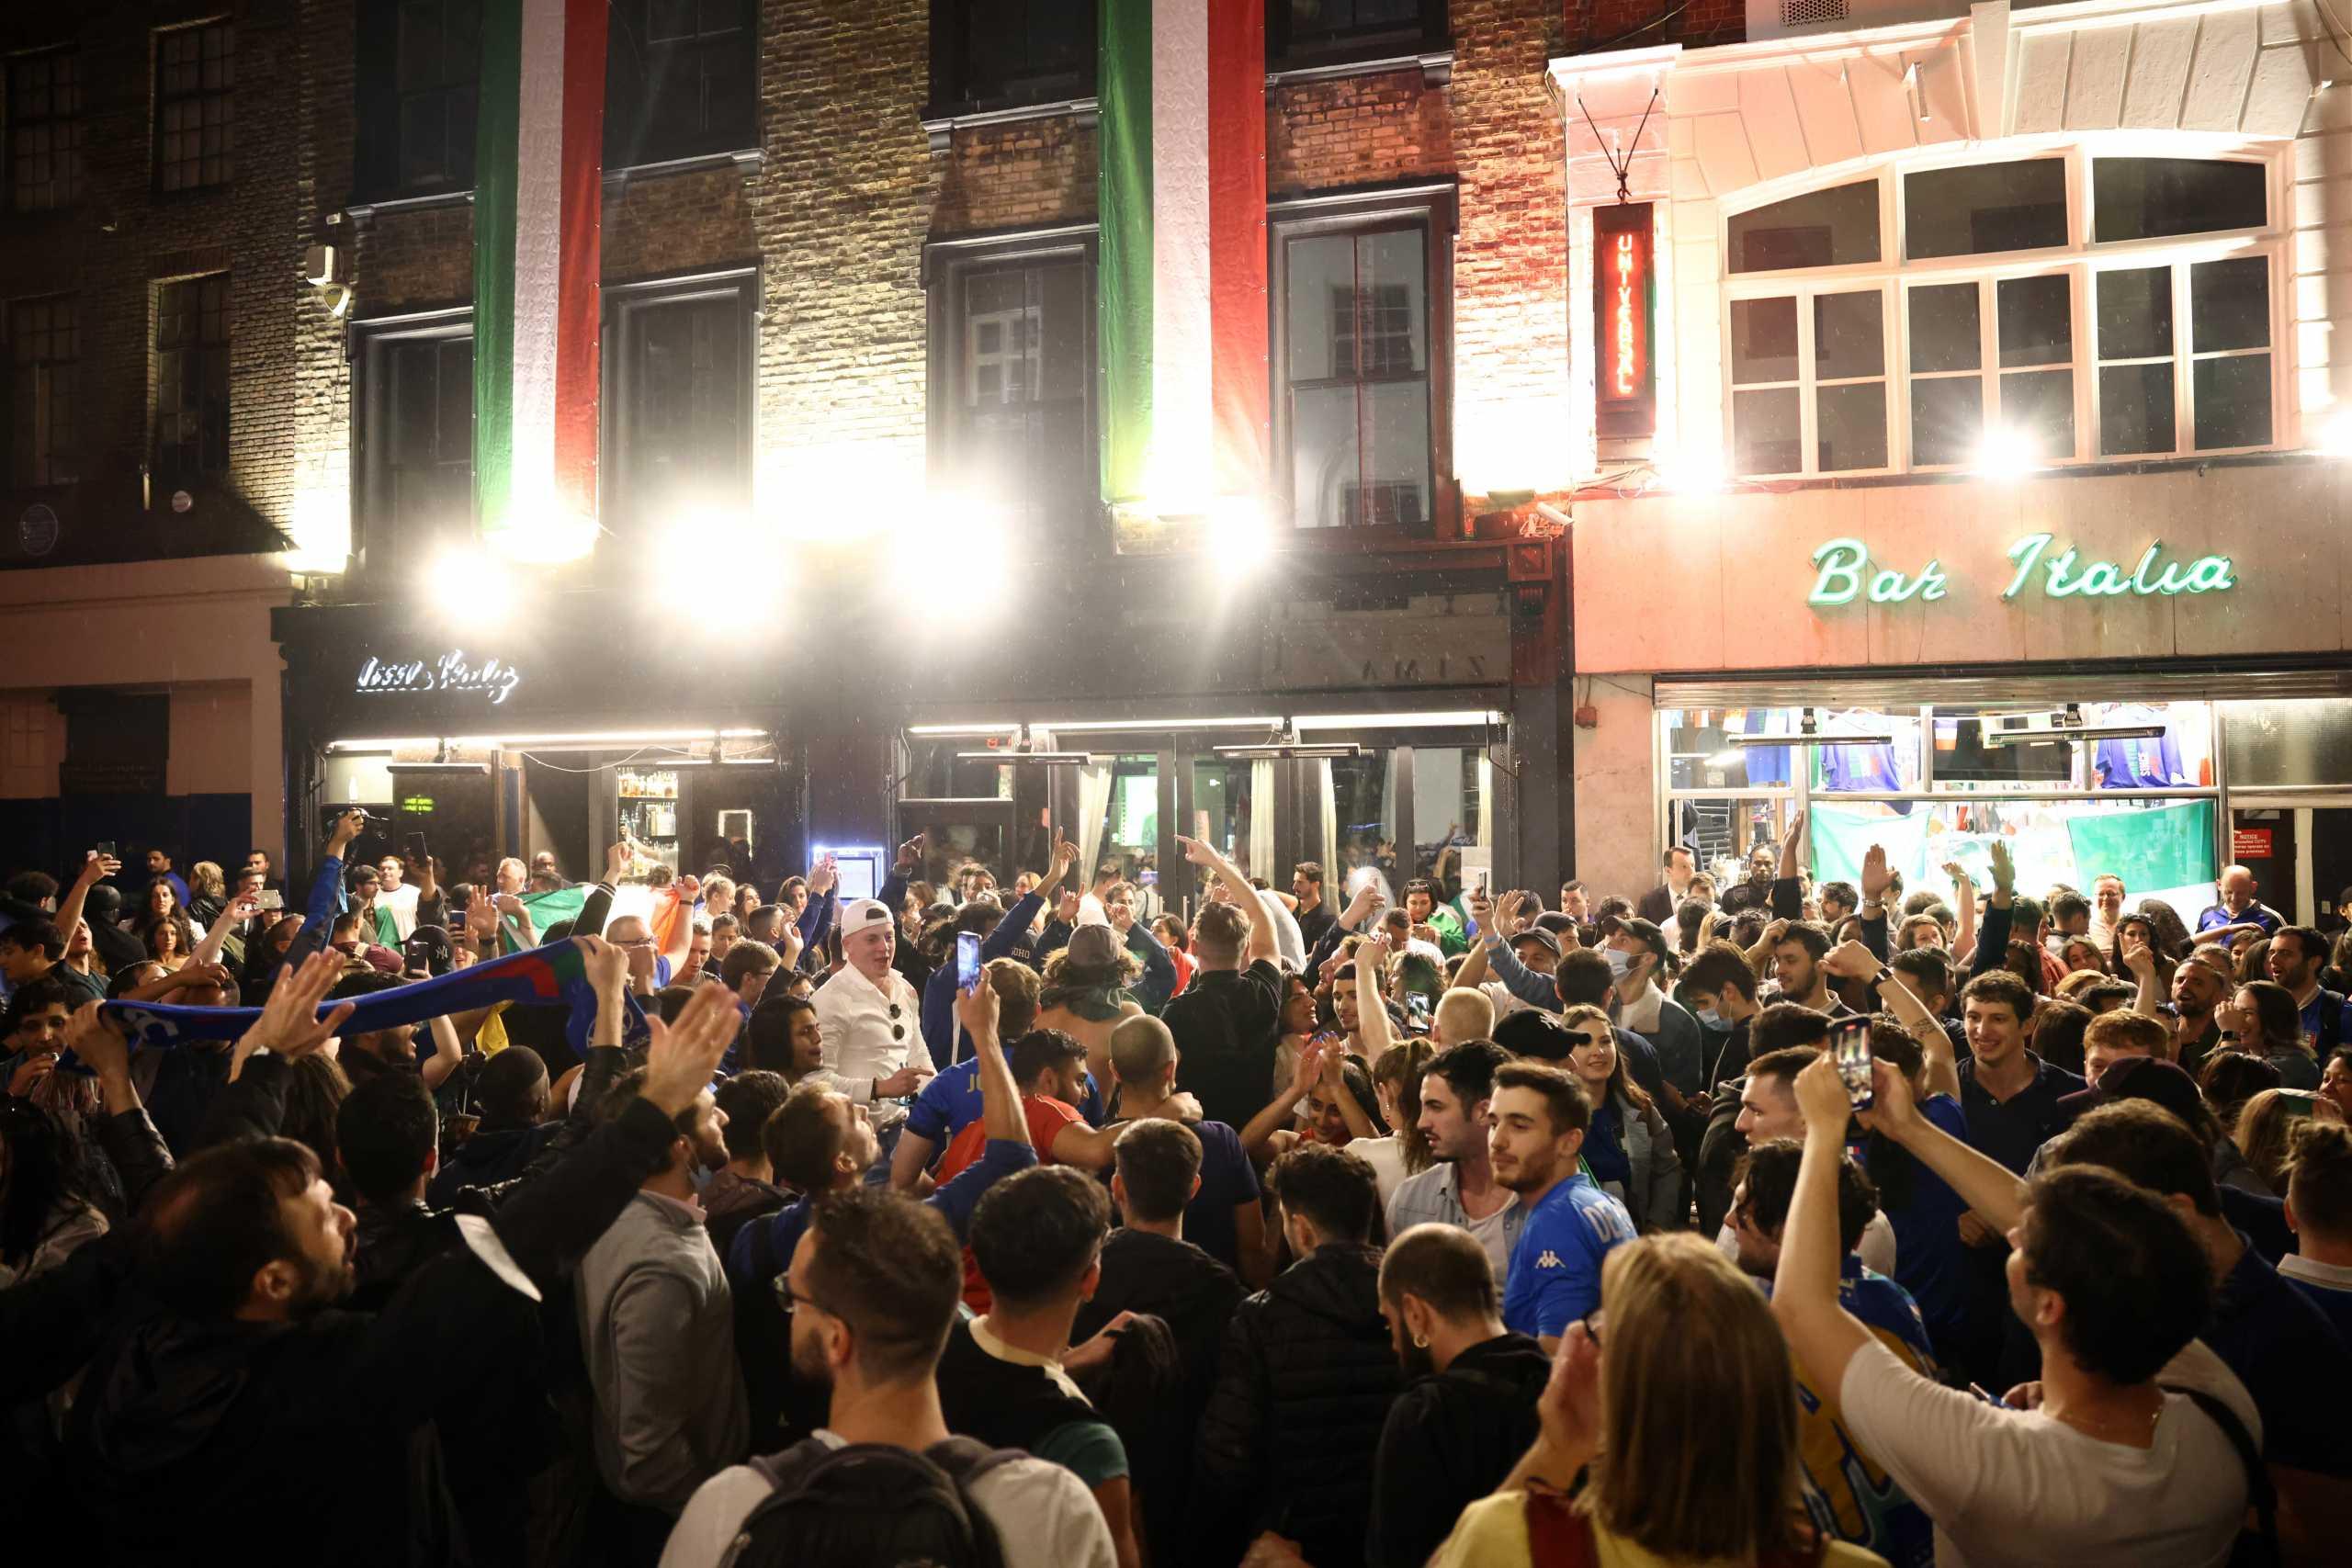 Euro 2020: Προειδοποιεί για τα χειρότερα ο ΠΟΥ μετά τις εικόνες από τα πλήθη φιλάθλων